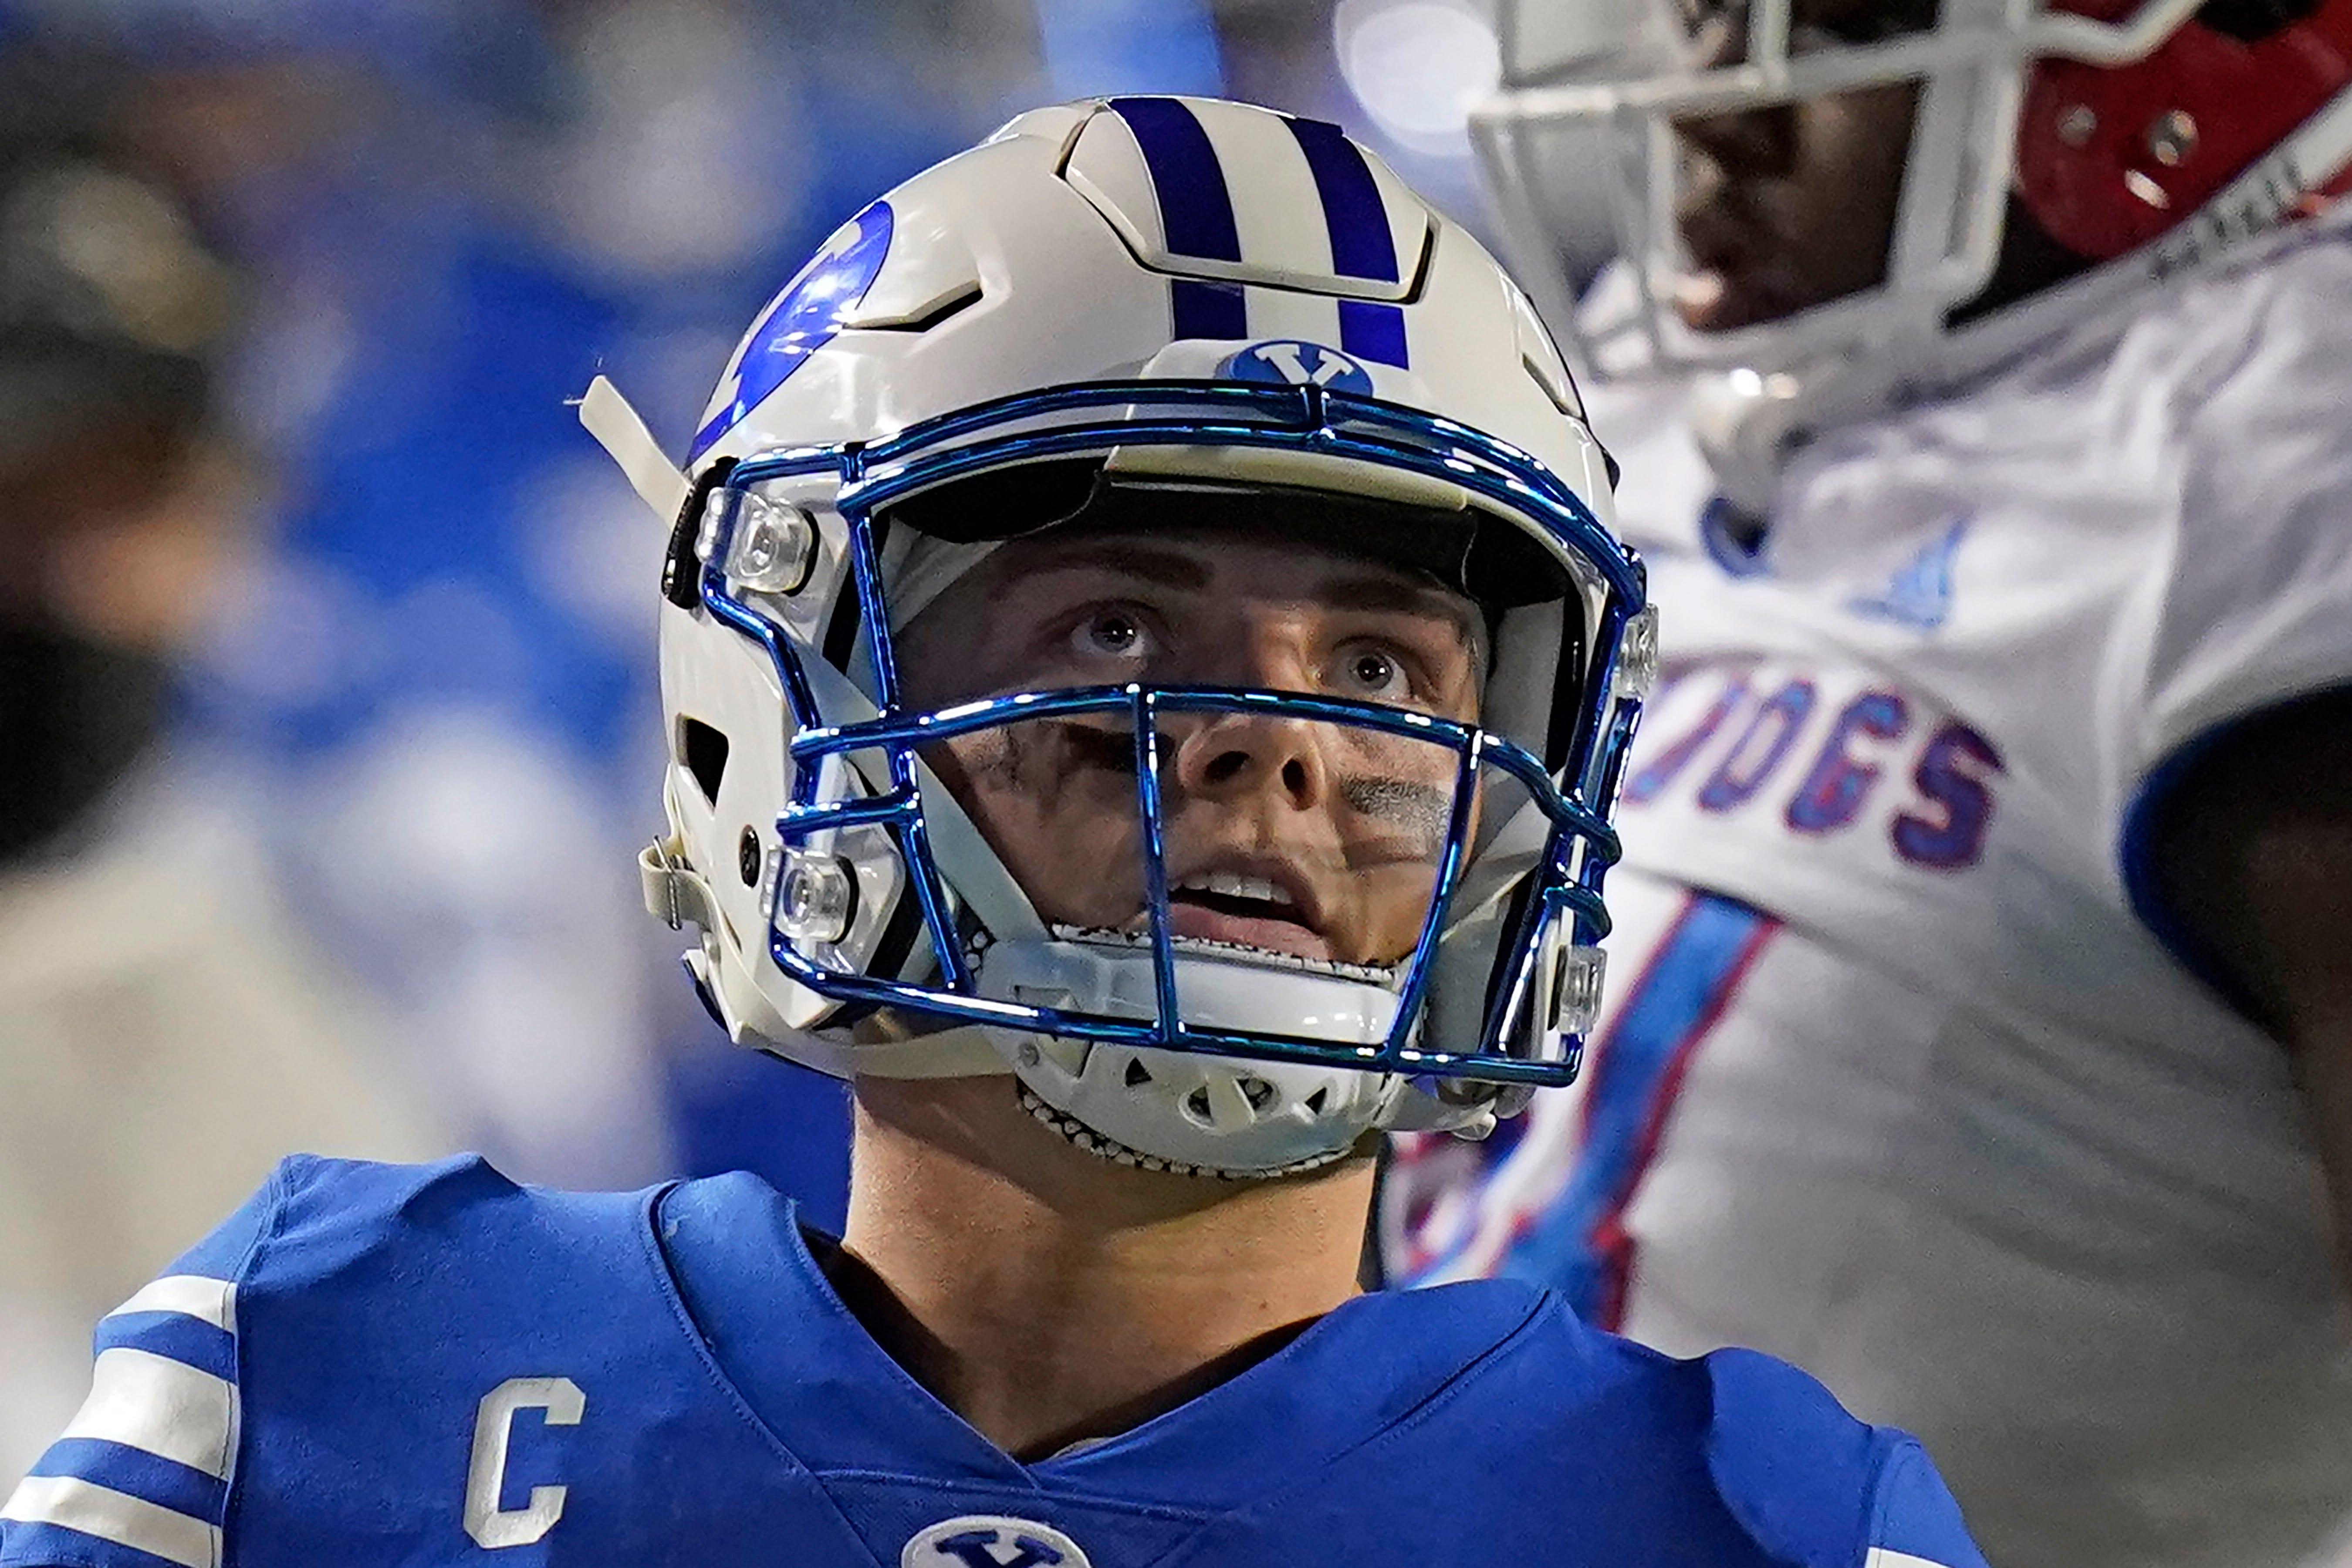 College football COVID-19 updates: Oklahoma-West Virginia postponed